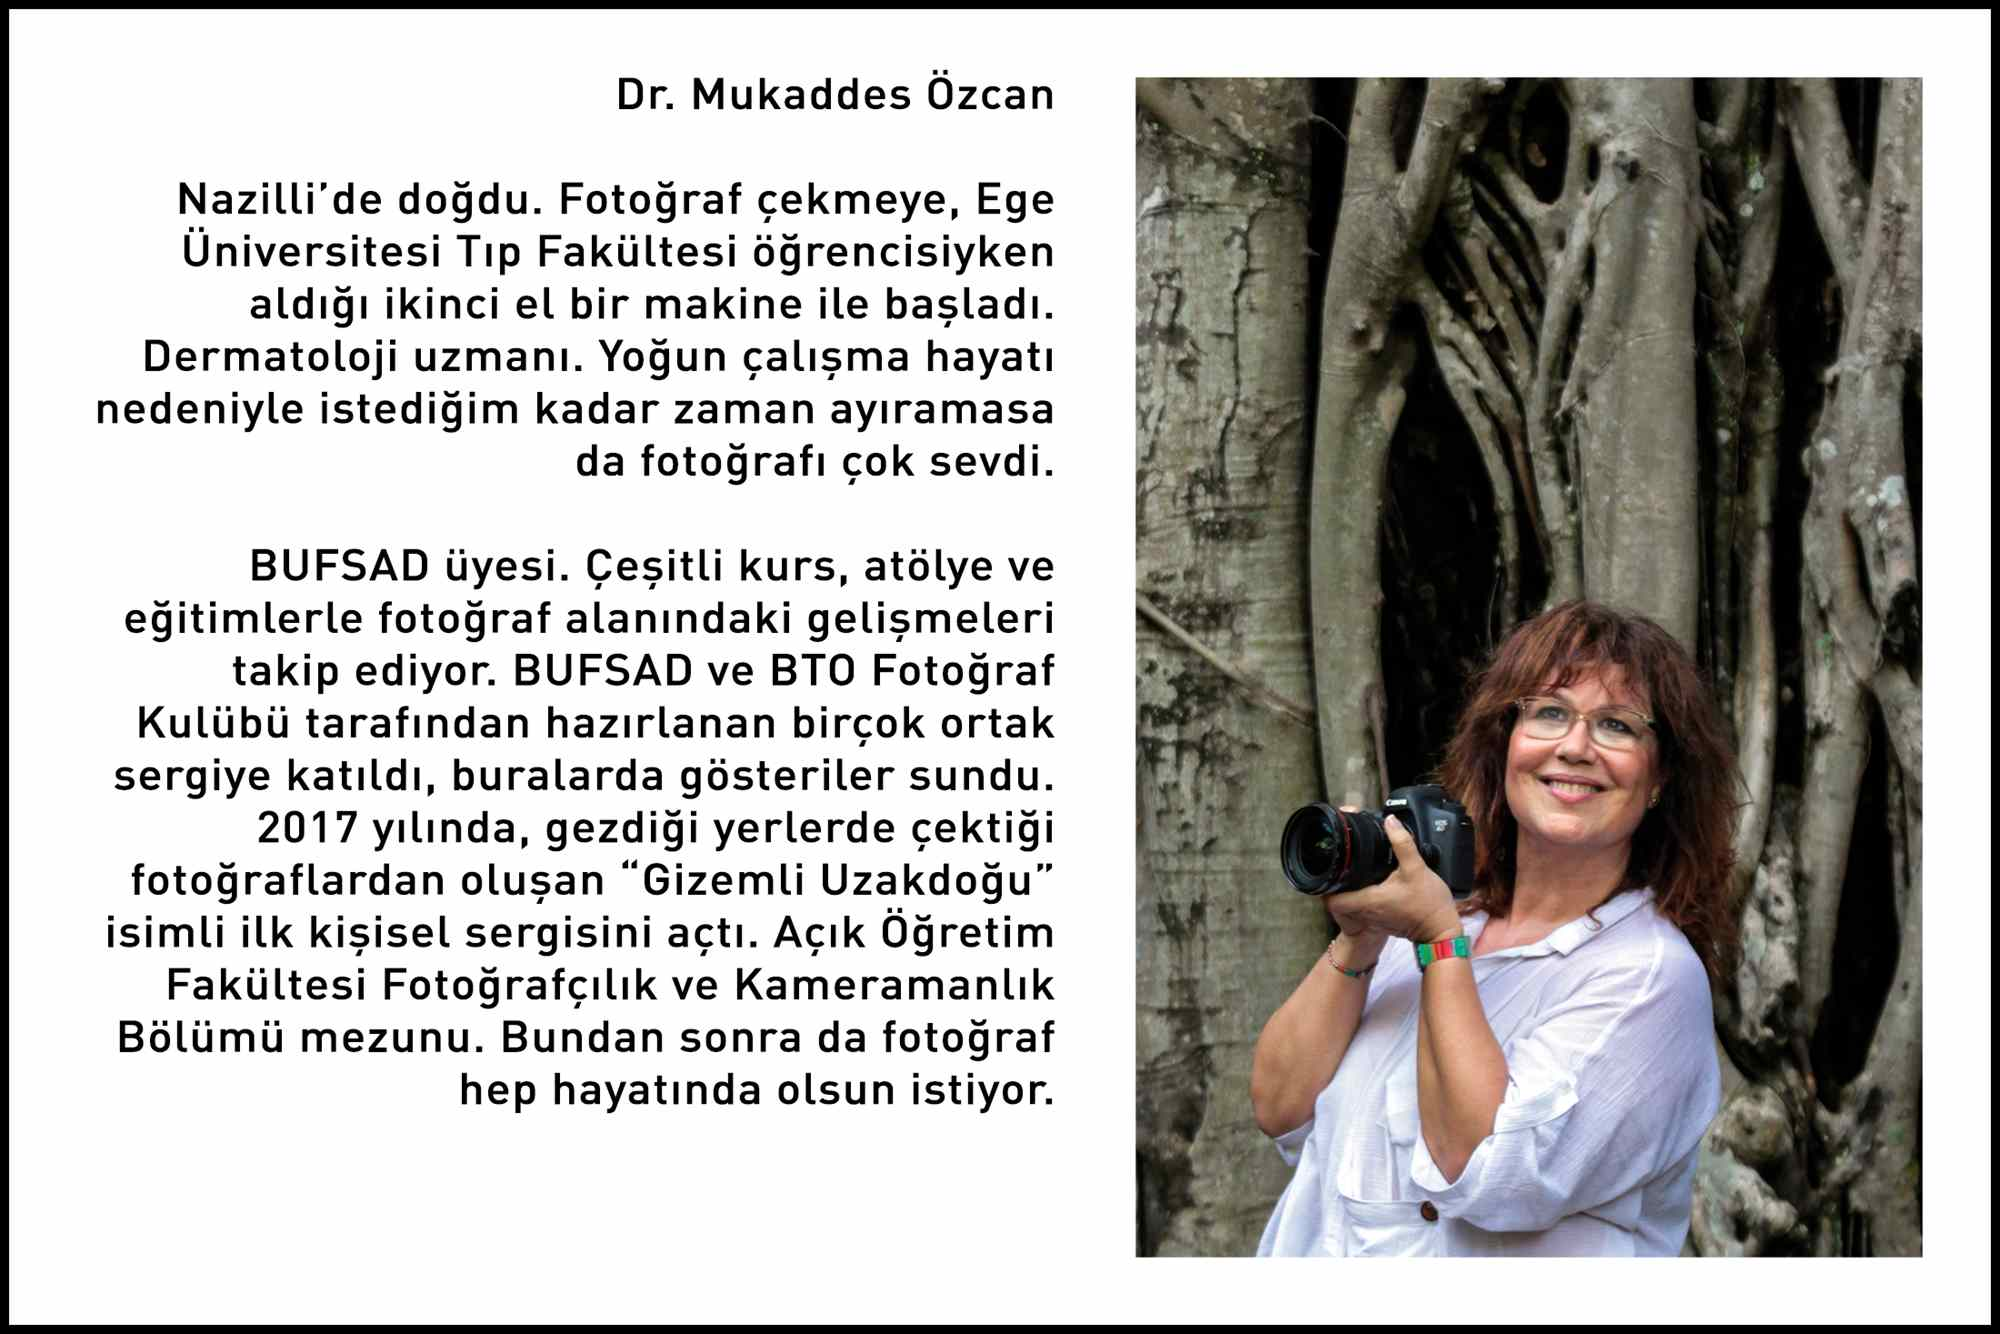 58_mukaddes-ozcan-ozgecmis